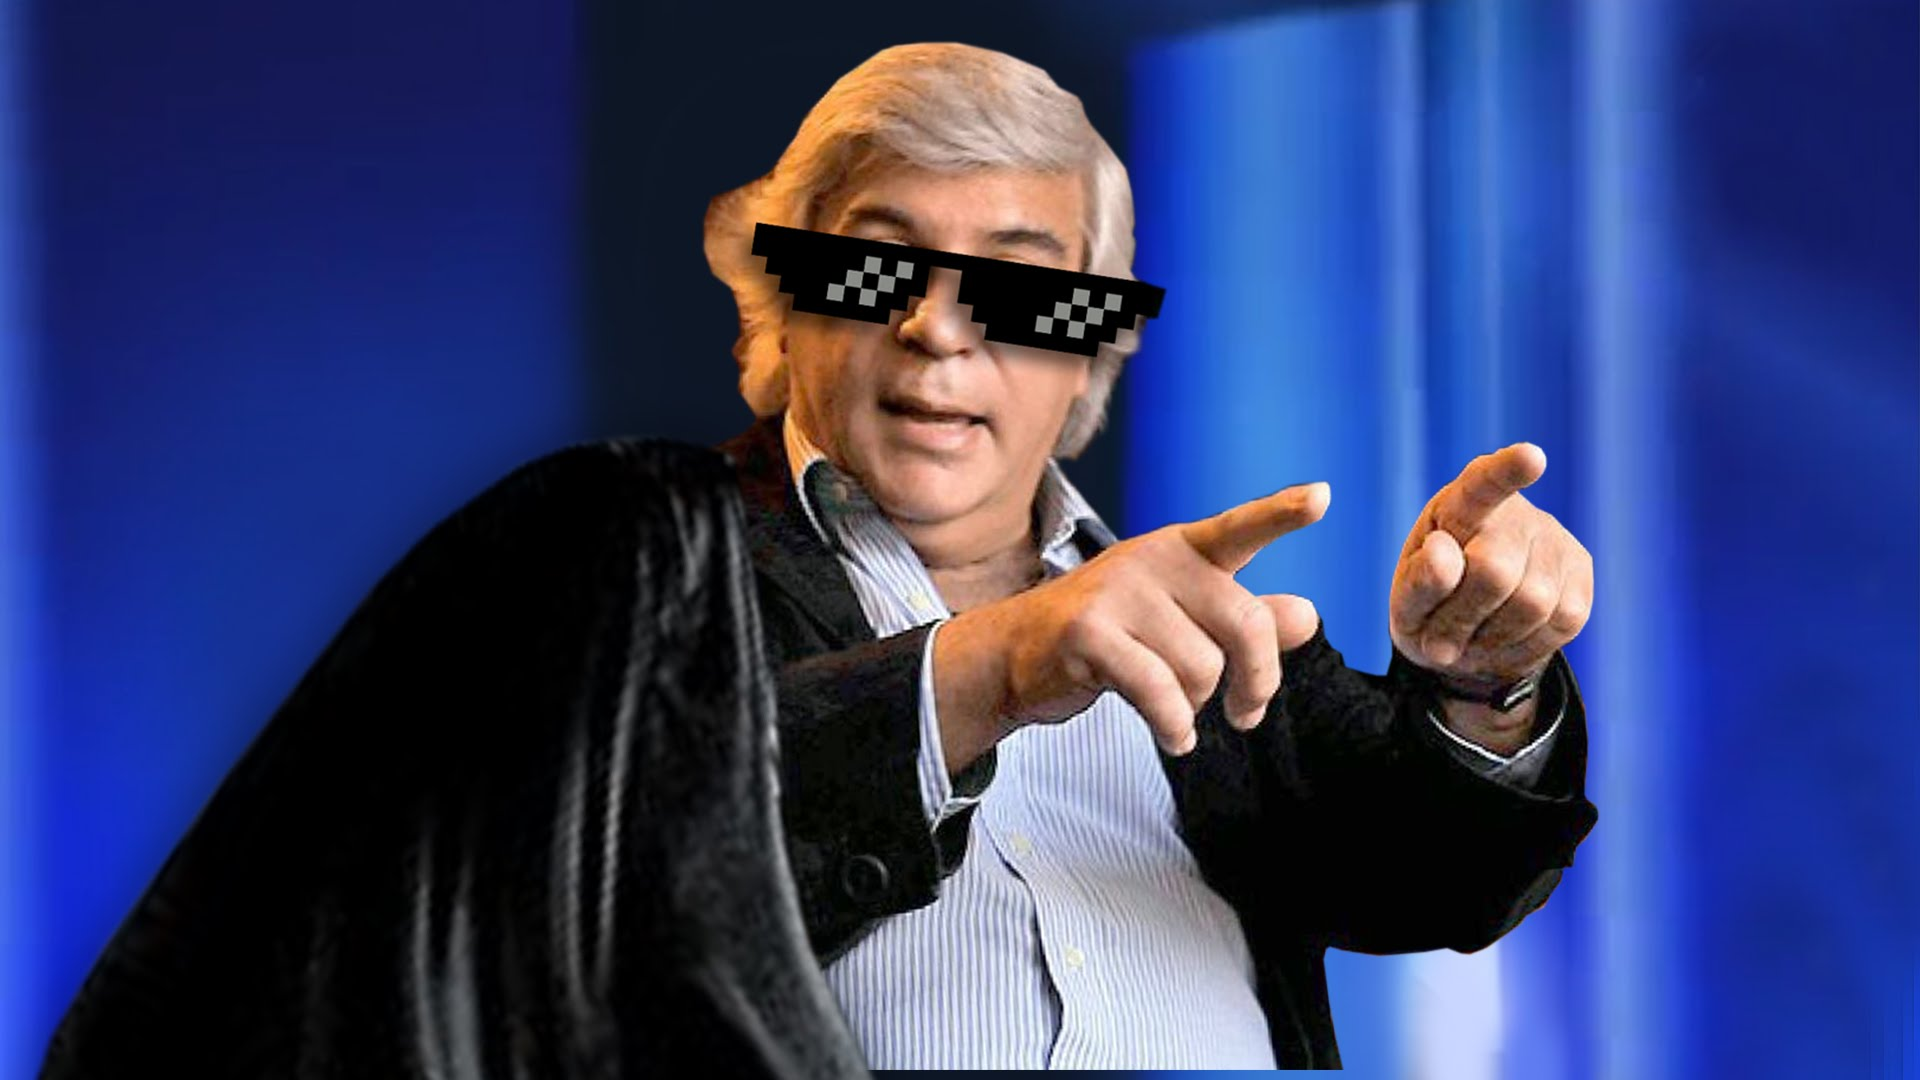 ¿El CM de CNN? Imagen: Youtube